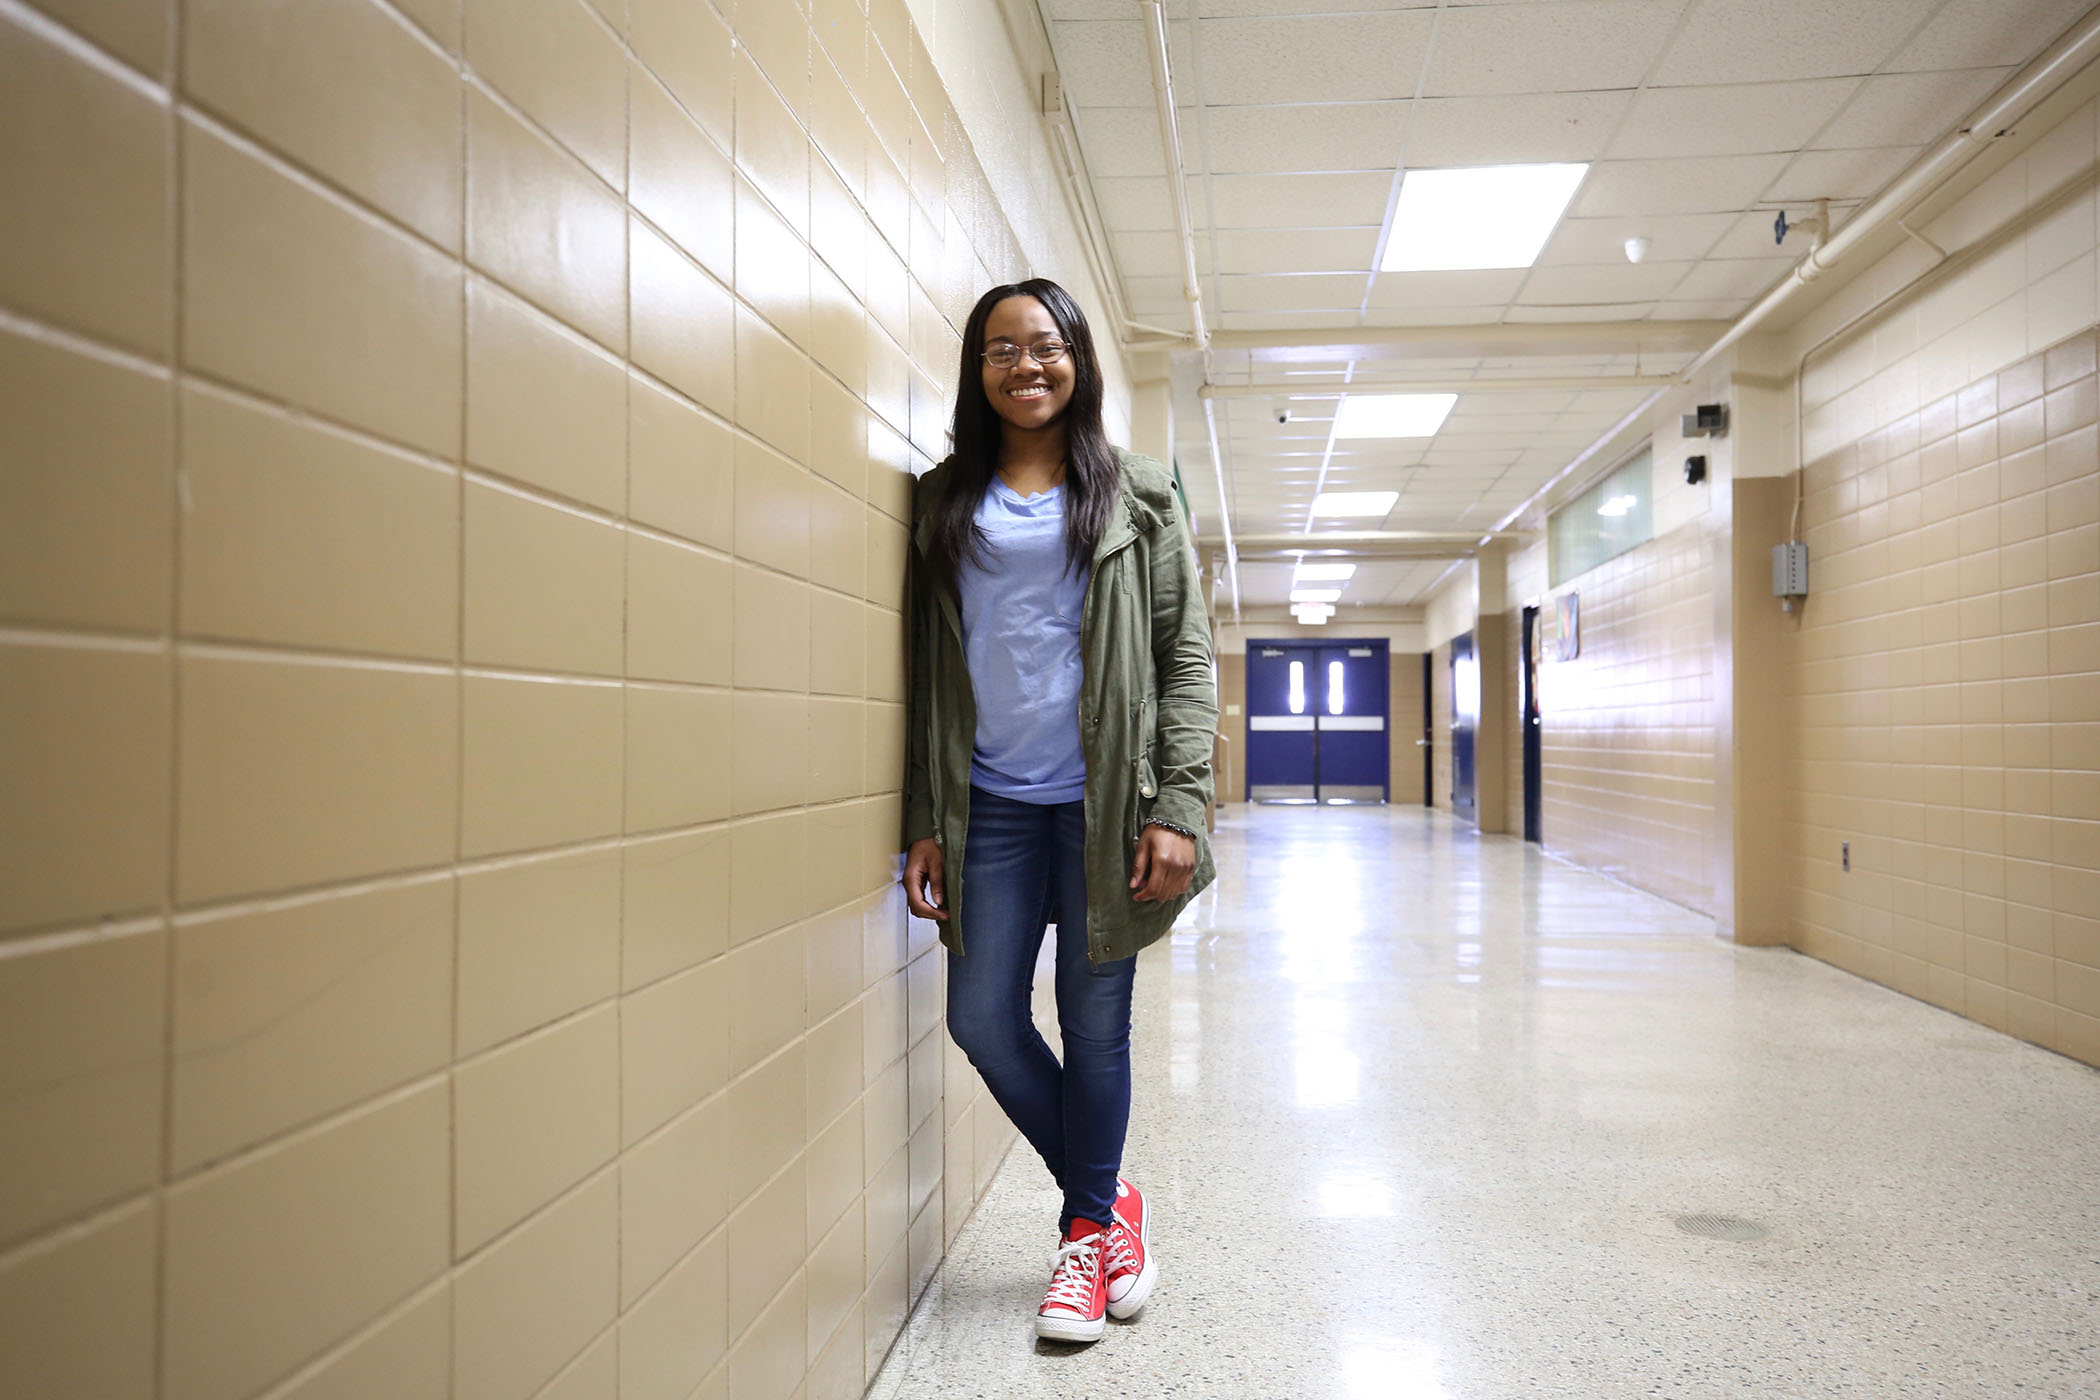 Amiya poses in the hallway.